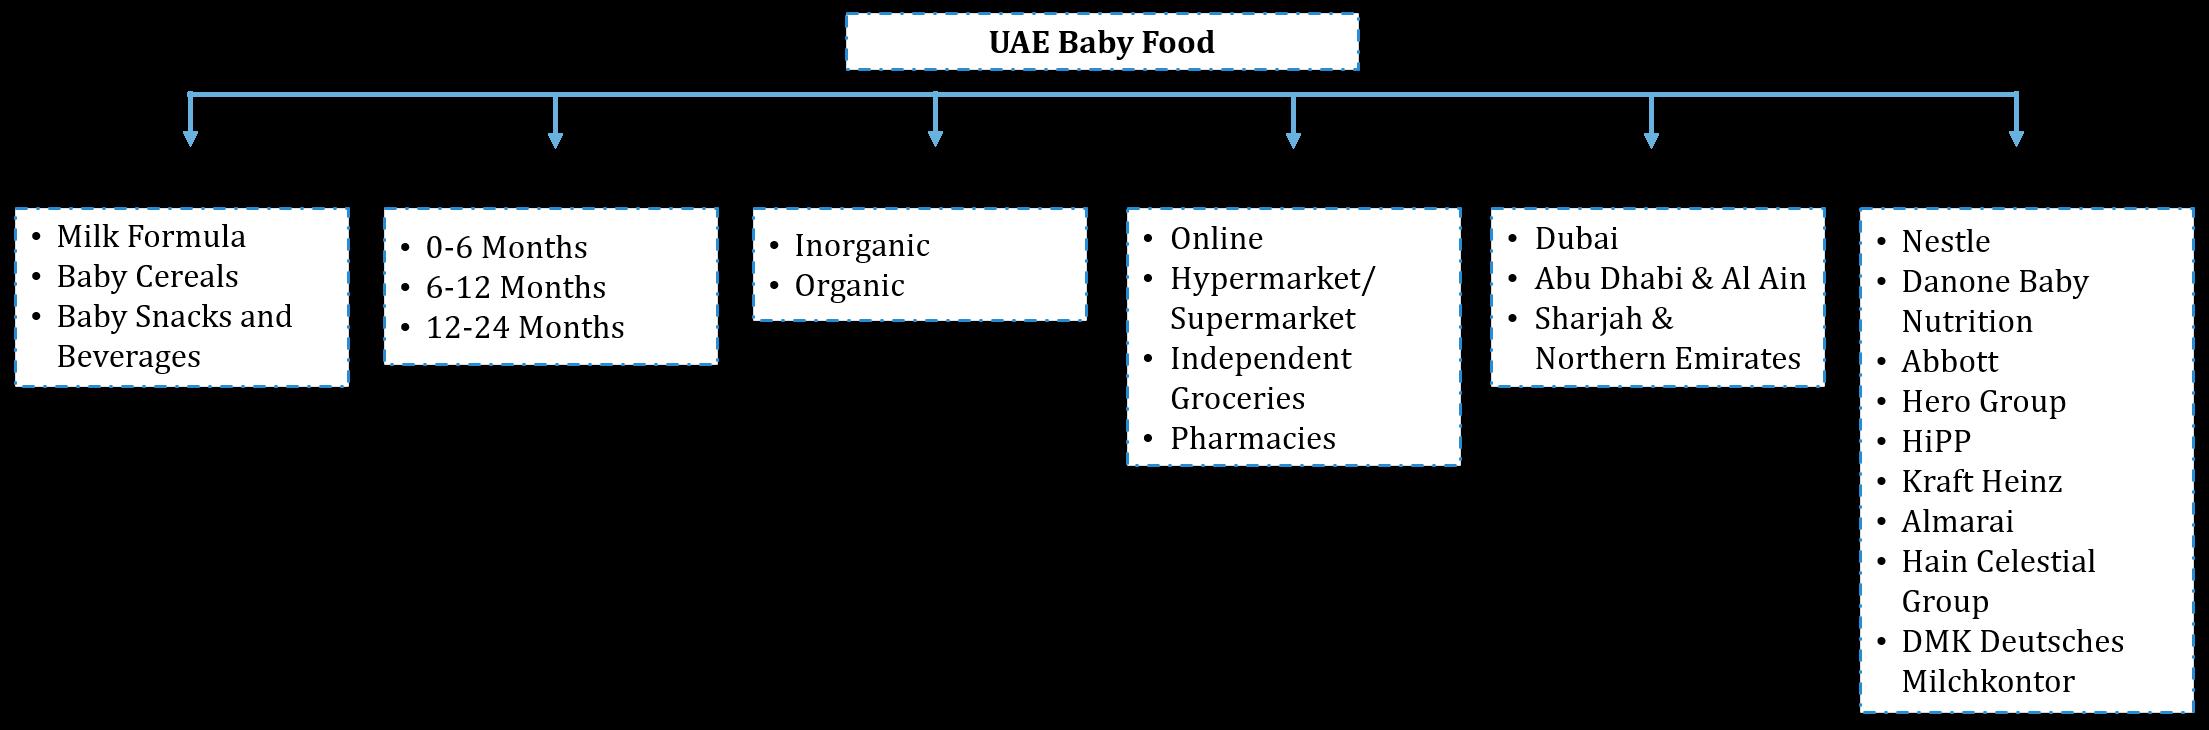 UAE Baby Food Market Segmentation